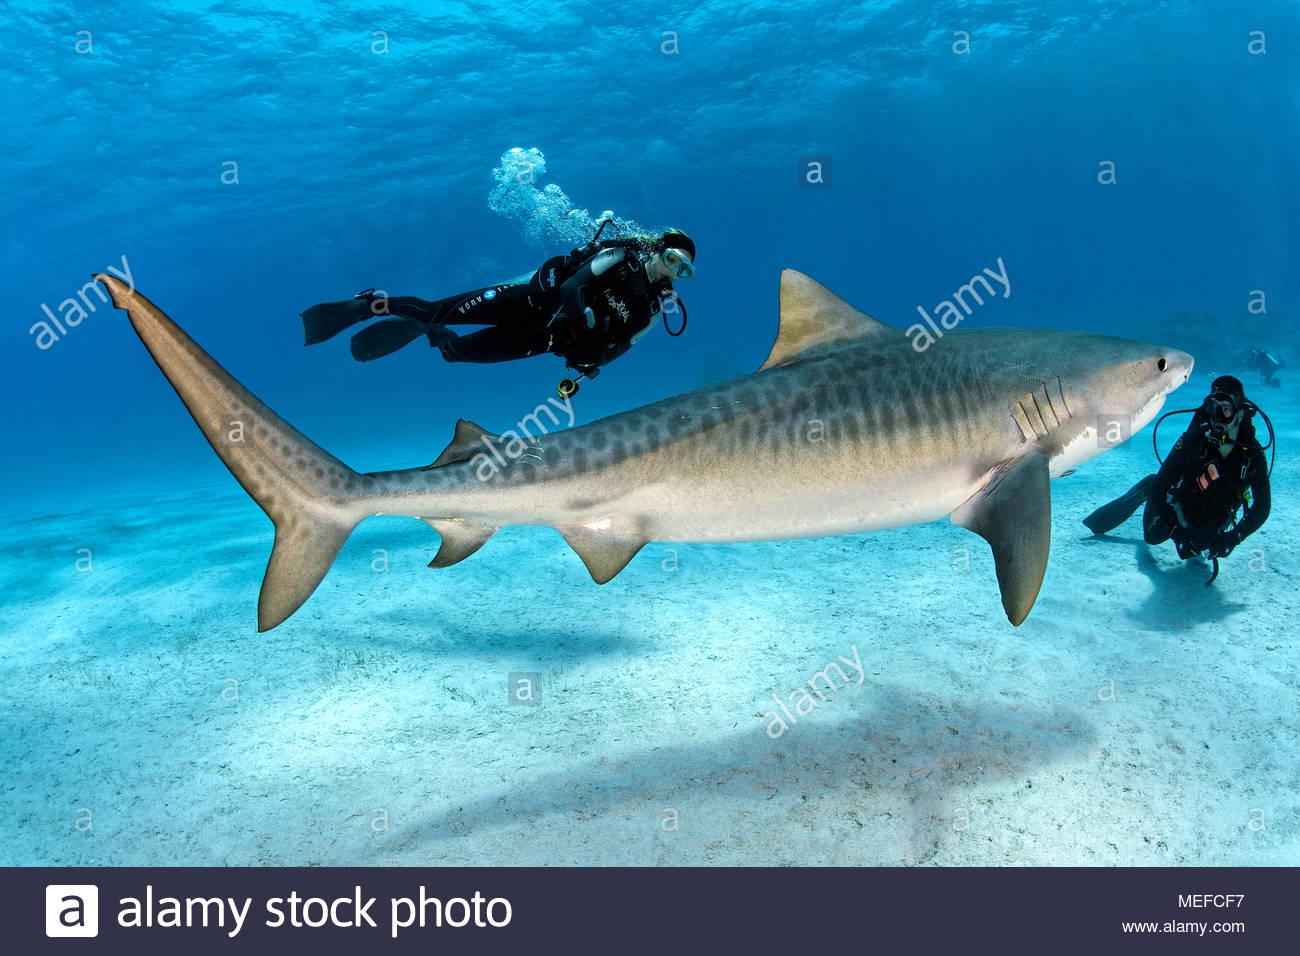 Taucher und Tigerhai (Galeocerdo cuvier), Bahamas | Scuba diver and Tiger shark (Galeocerdo cuvier), Bahama Banks, Bahamas - Stock Image